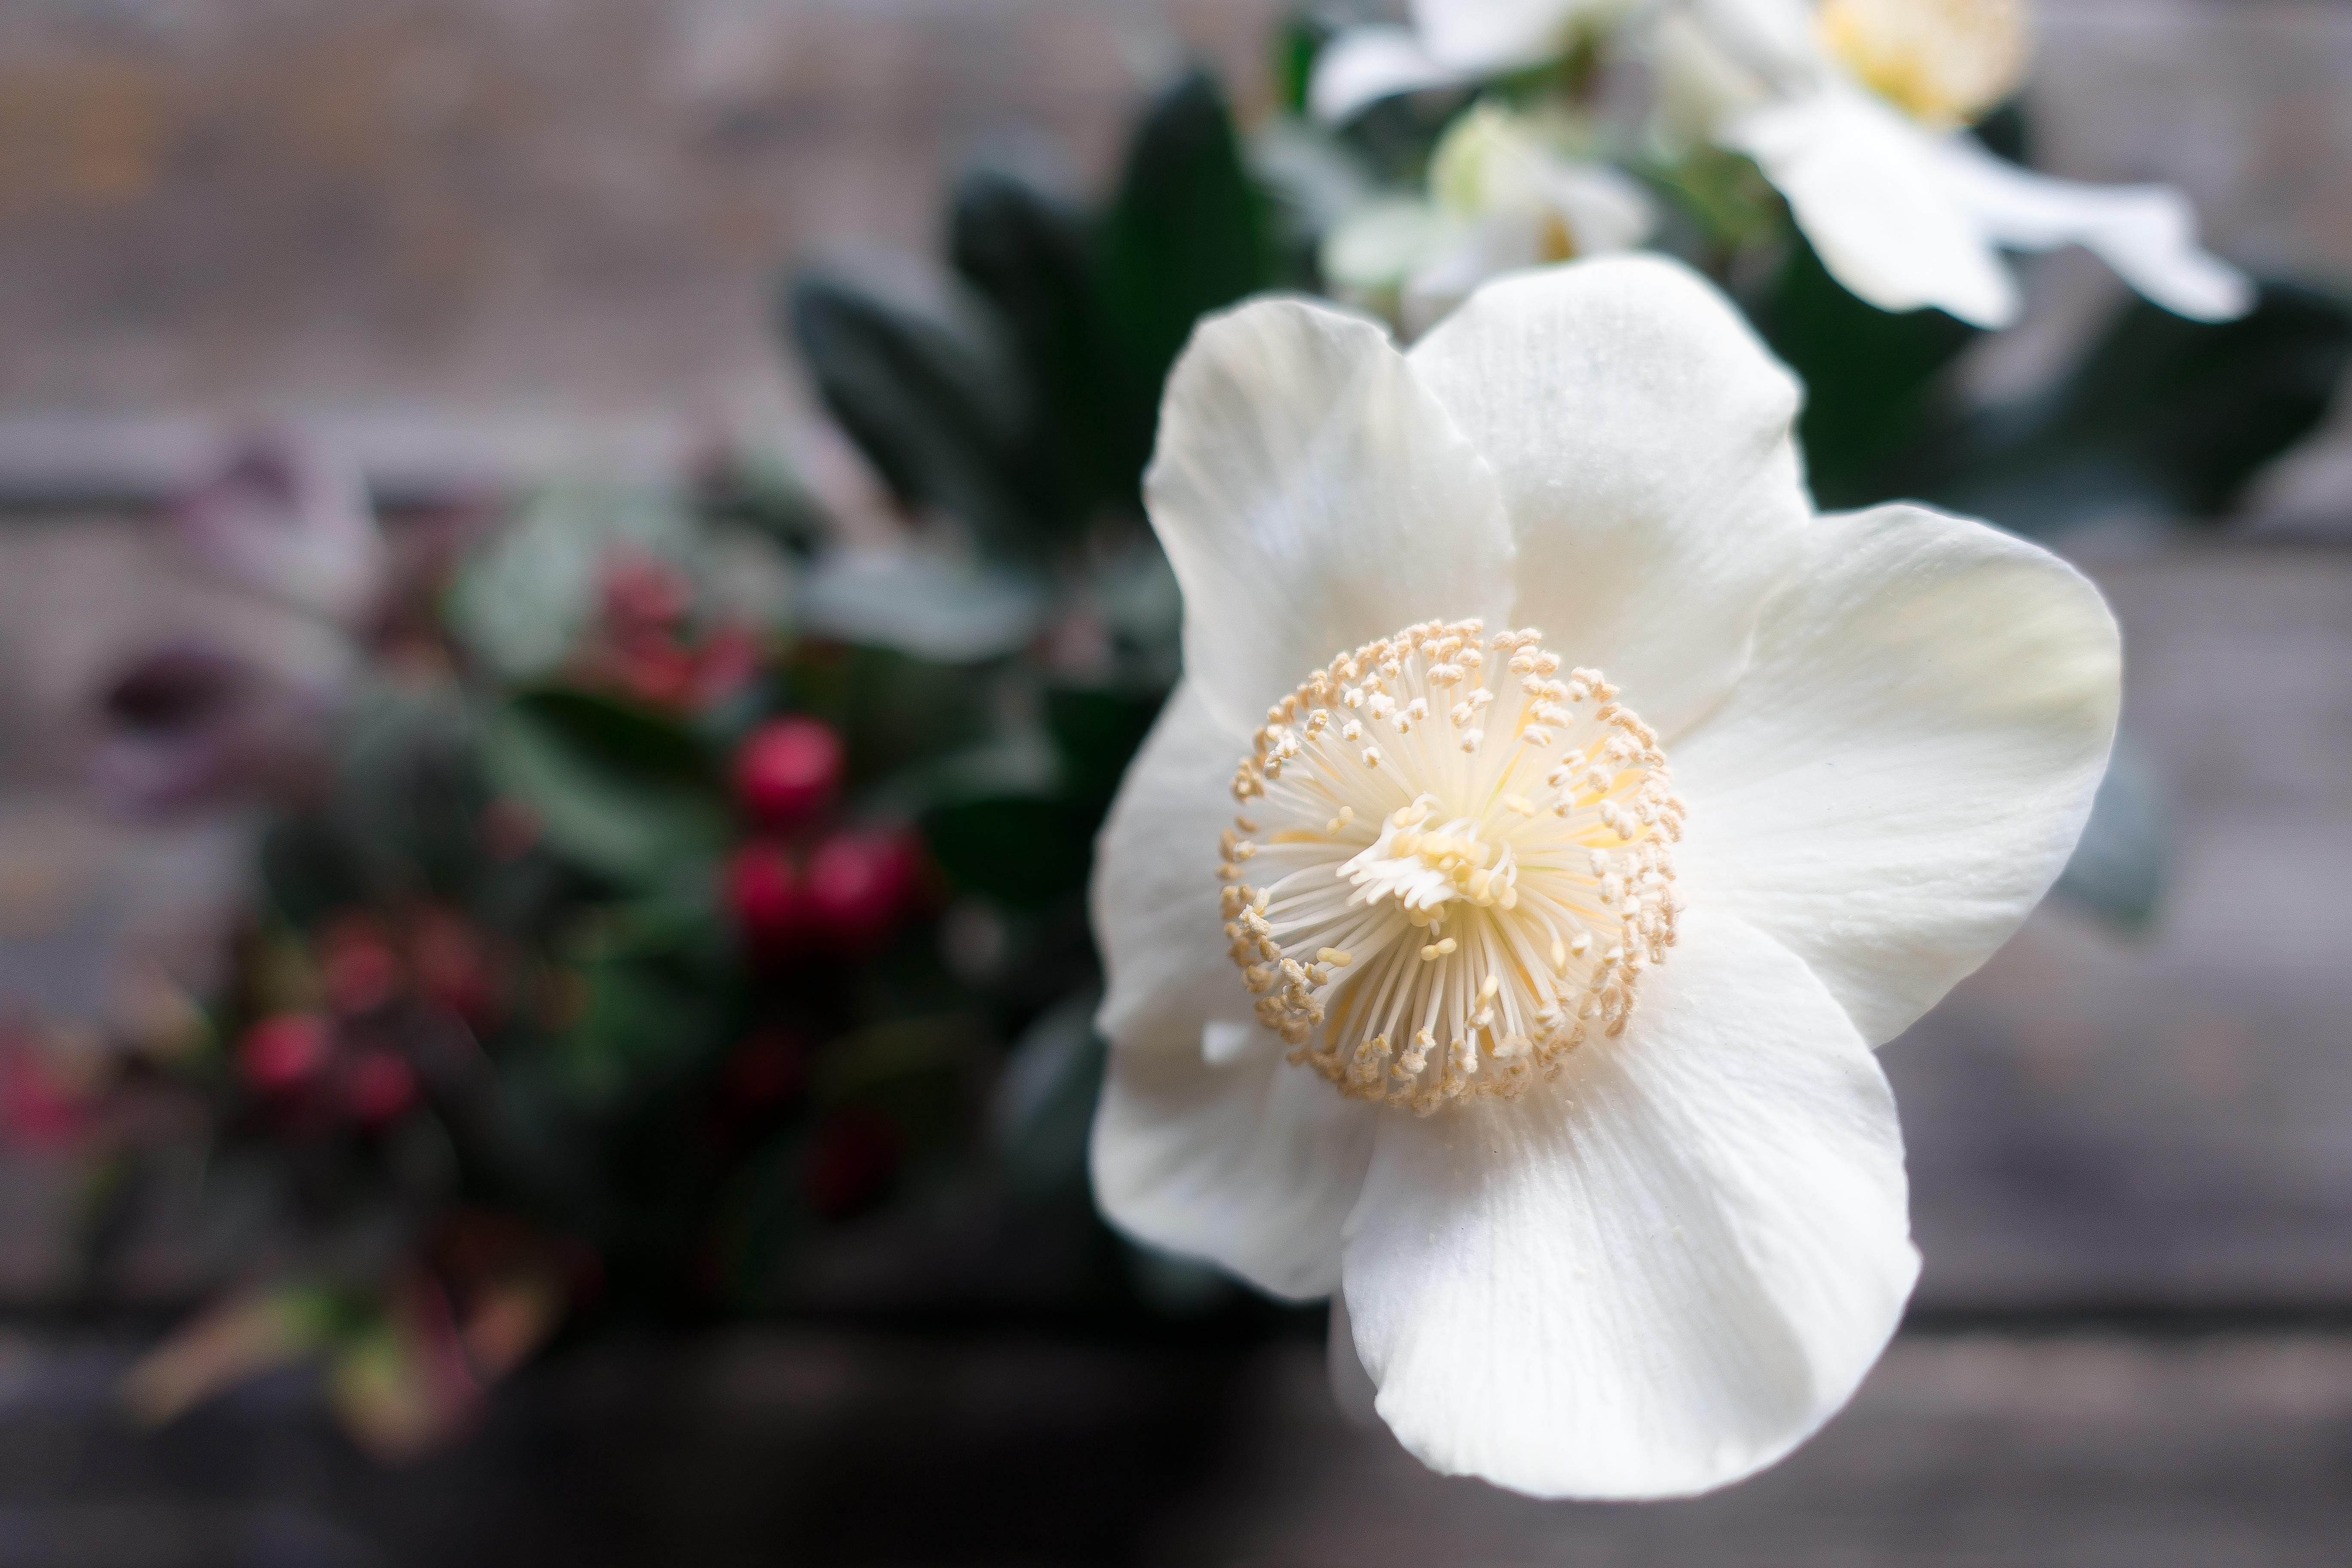 Free Images Nature Blossom Petal Bloom Botany Flora White